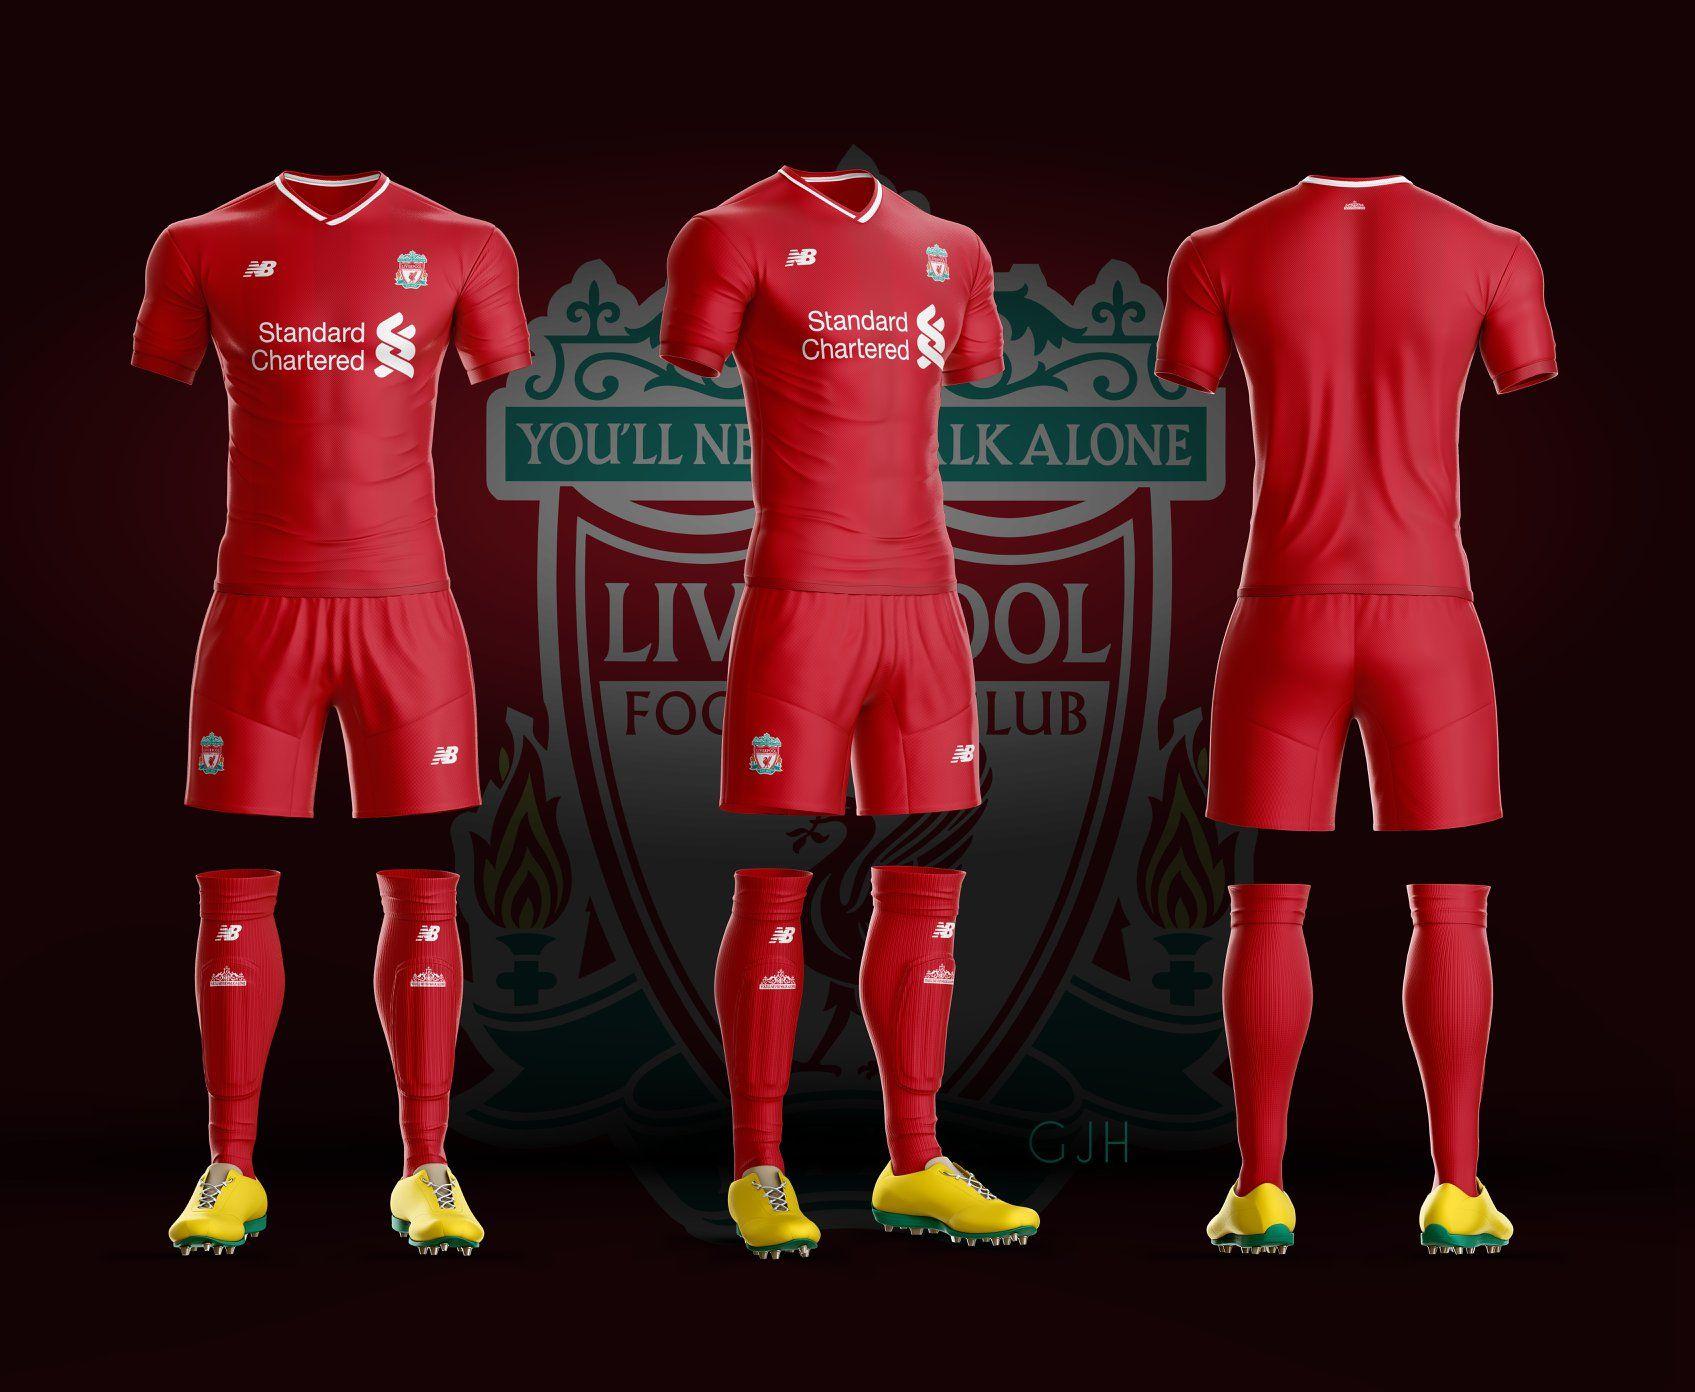 Soccer Uniform Liverpool Football Club Imaginary Uniform 2018 02